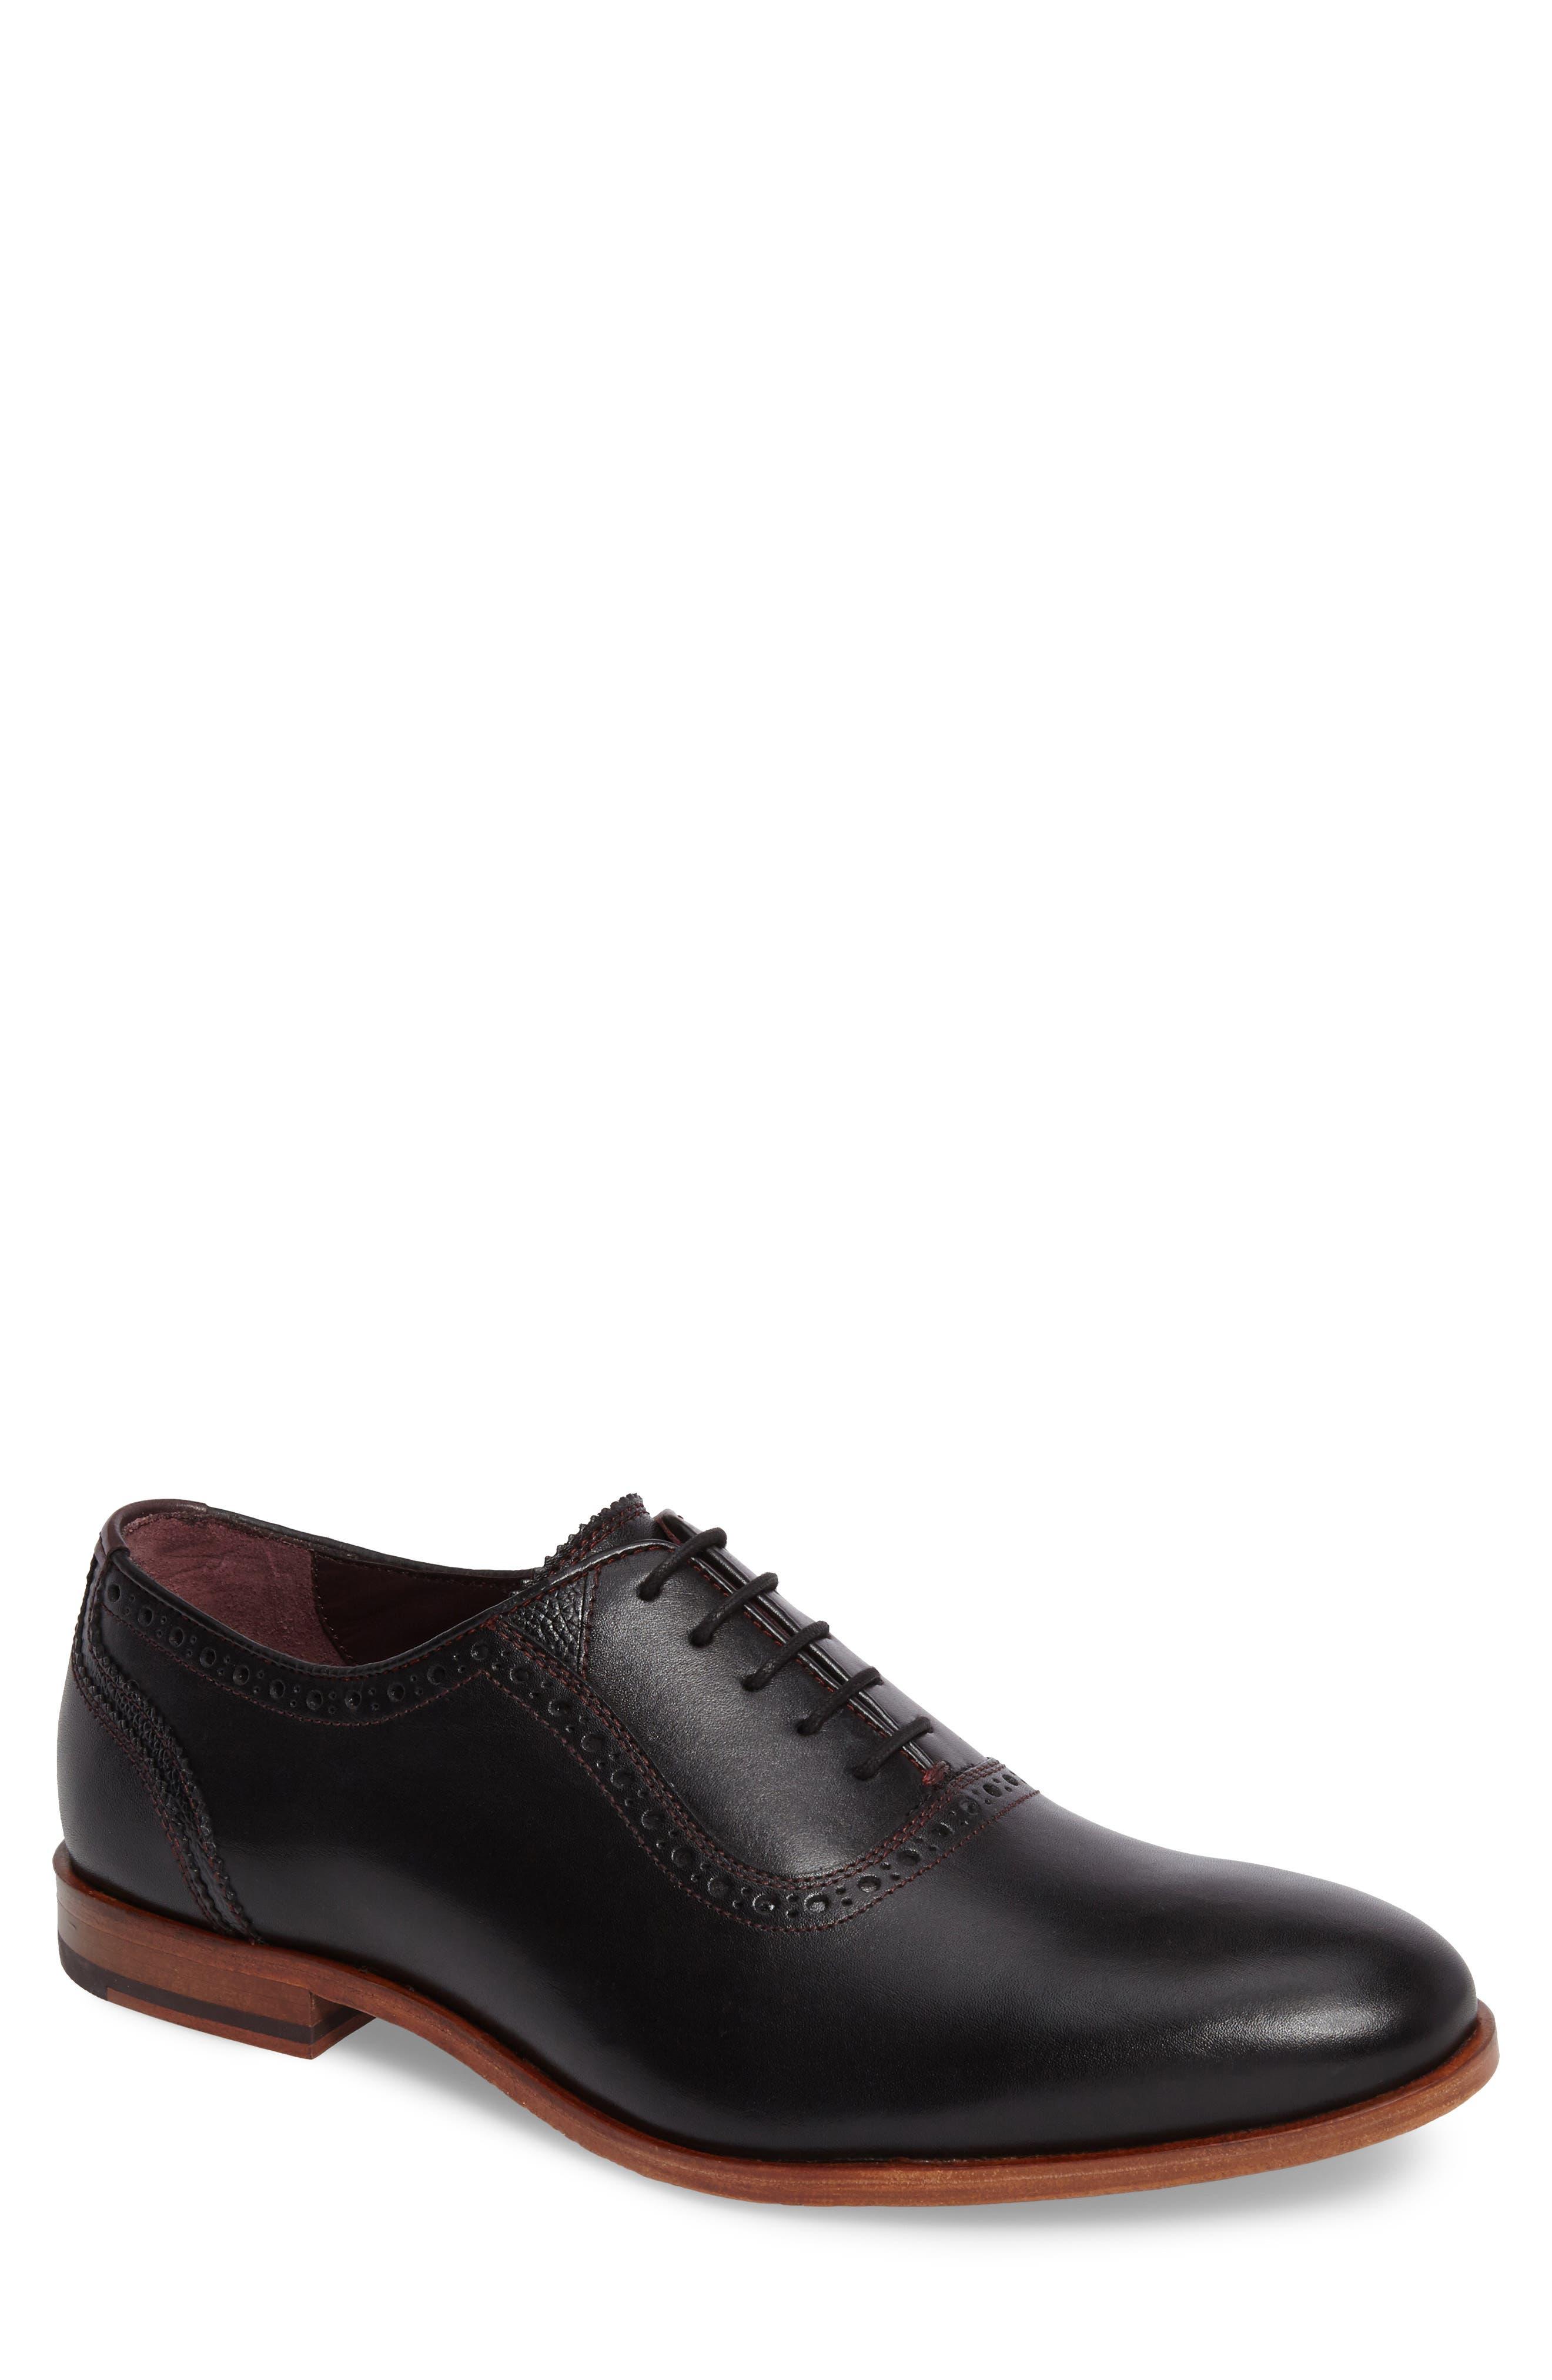 Anice Plain Toe Oxford,                             Main thumbnail 1, color,                             Black Leather